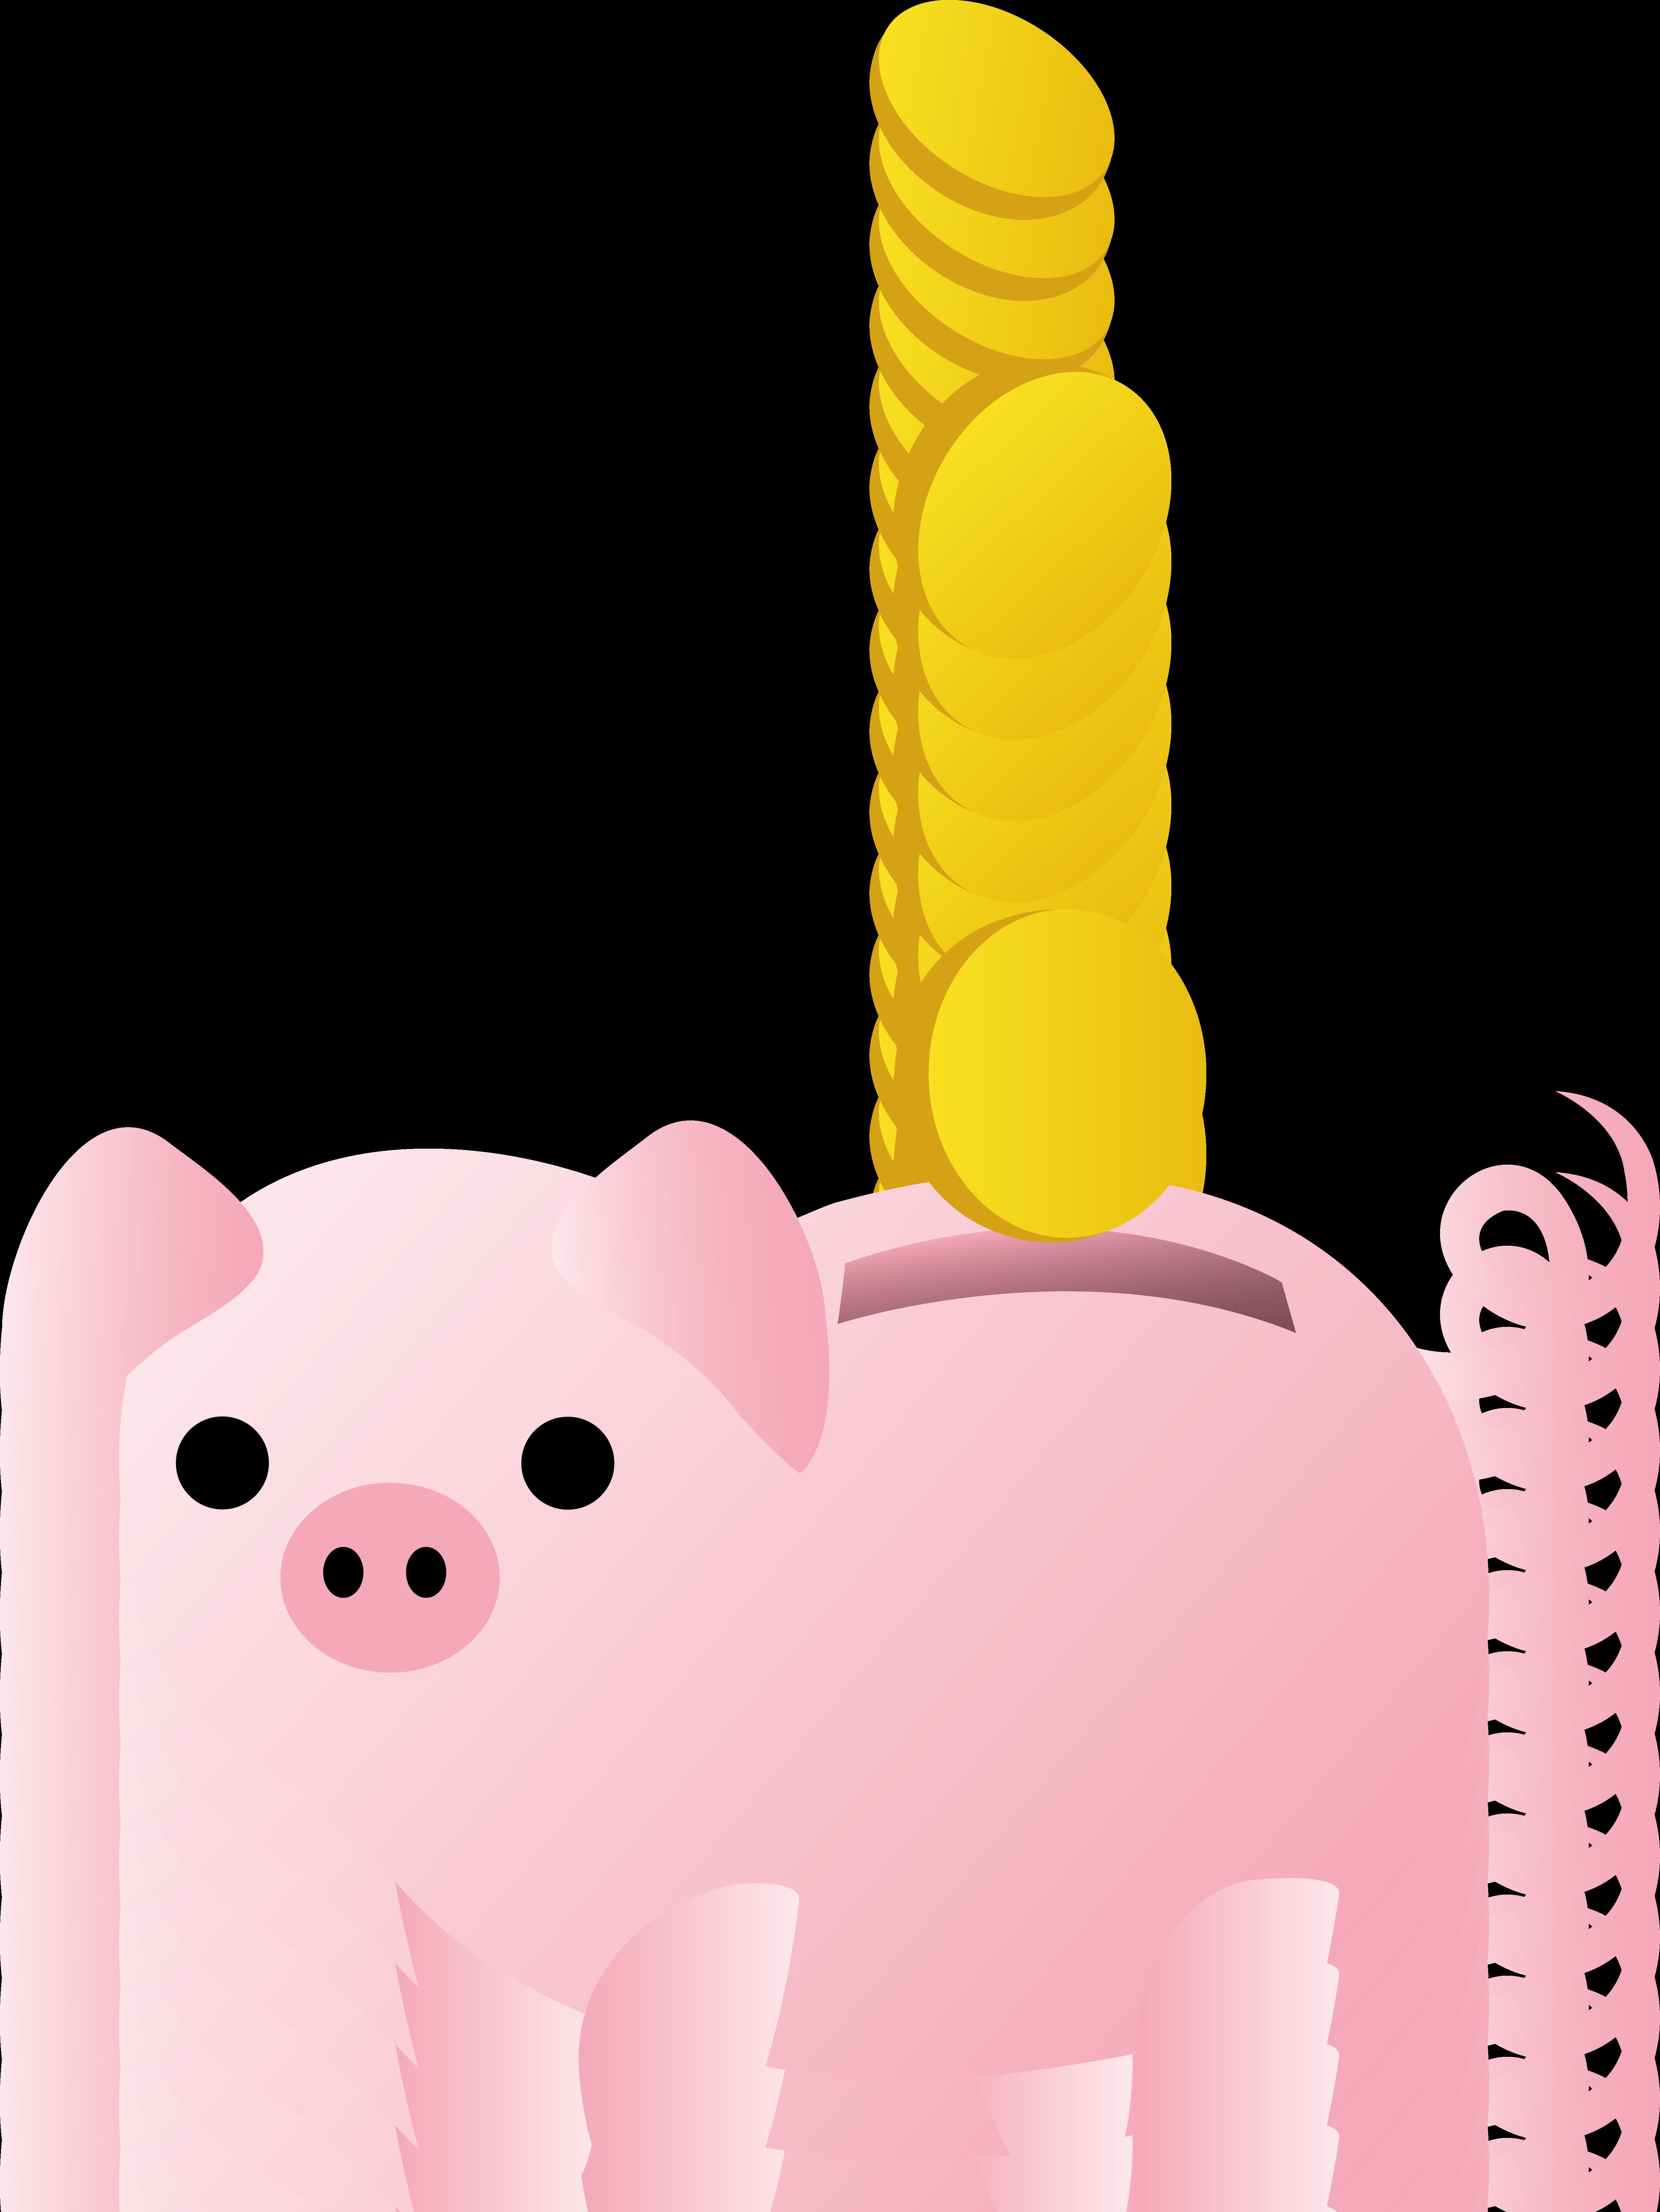 Coin clipart cute Clip Piggy Piggy Clip With